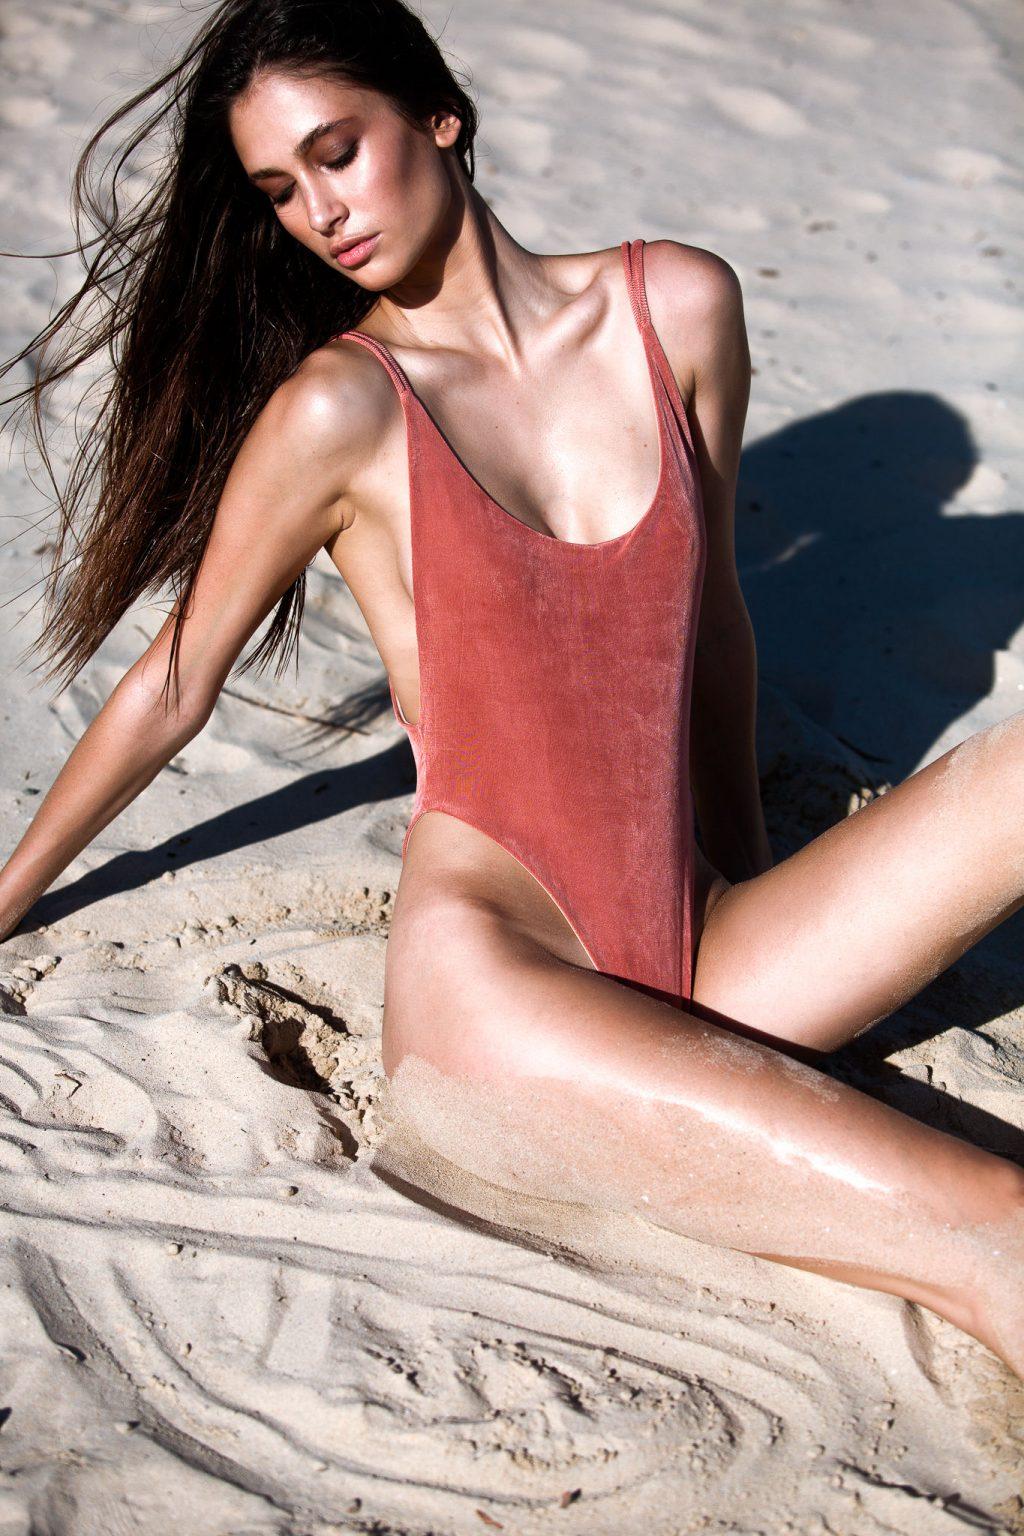 Topless Stefanny Agius naked (27 photos), Tits, Paparazzi, Feet, braless 2018